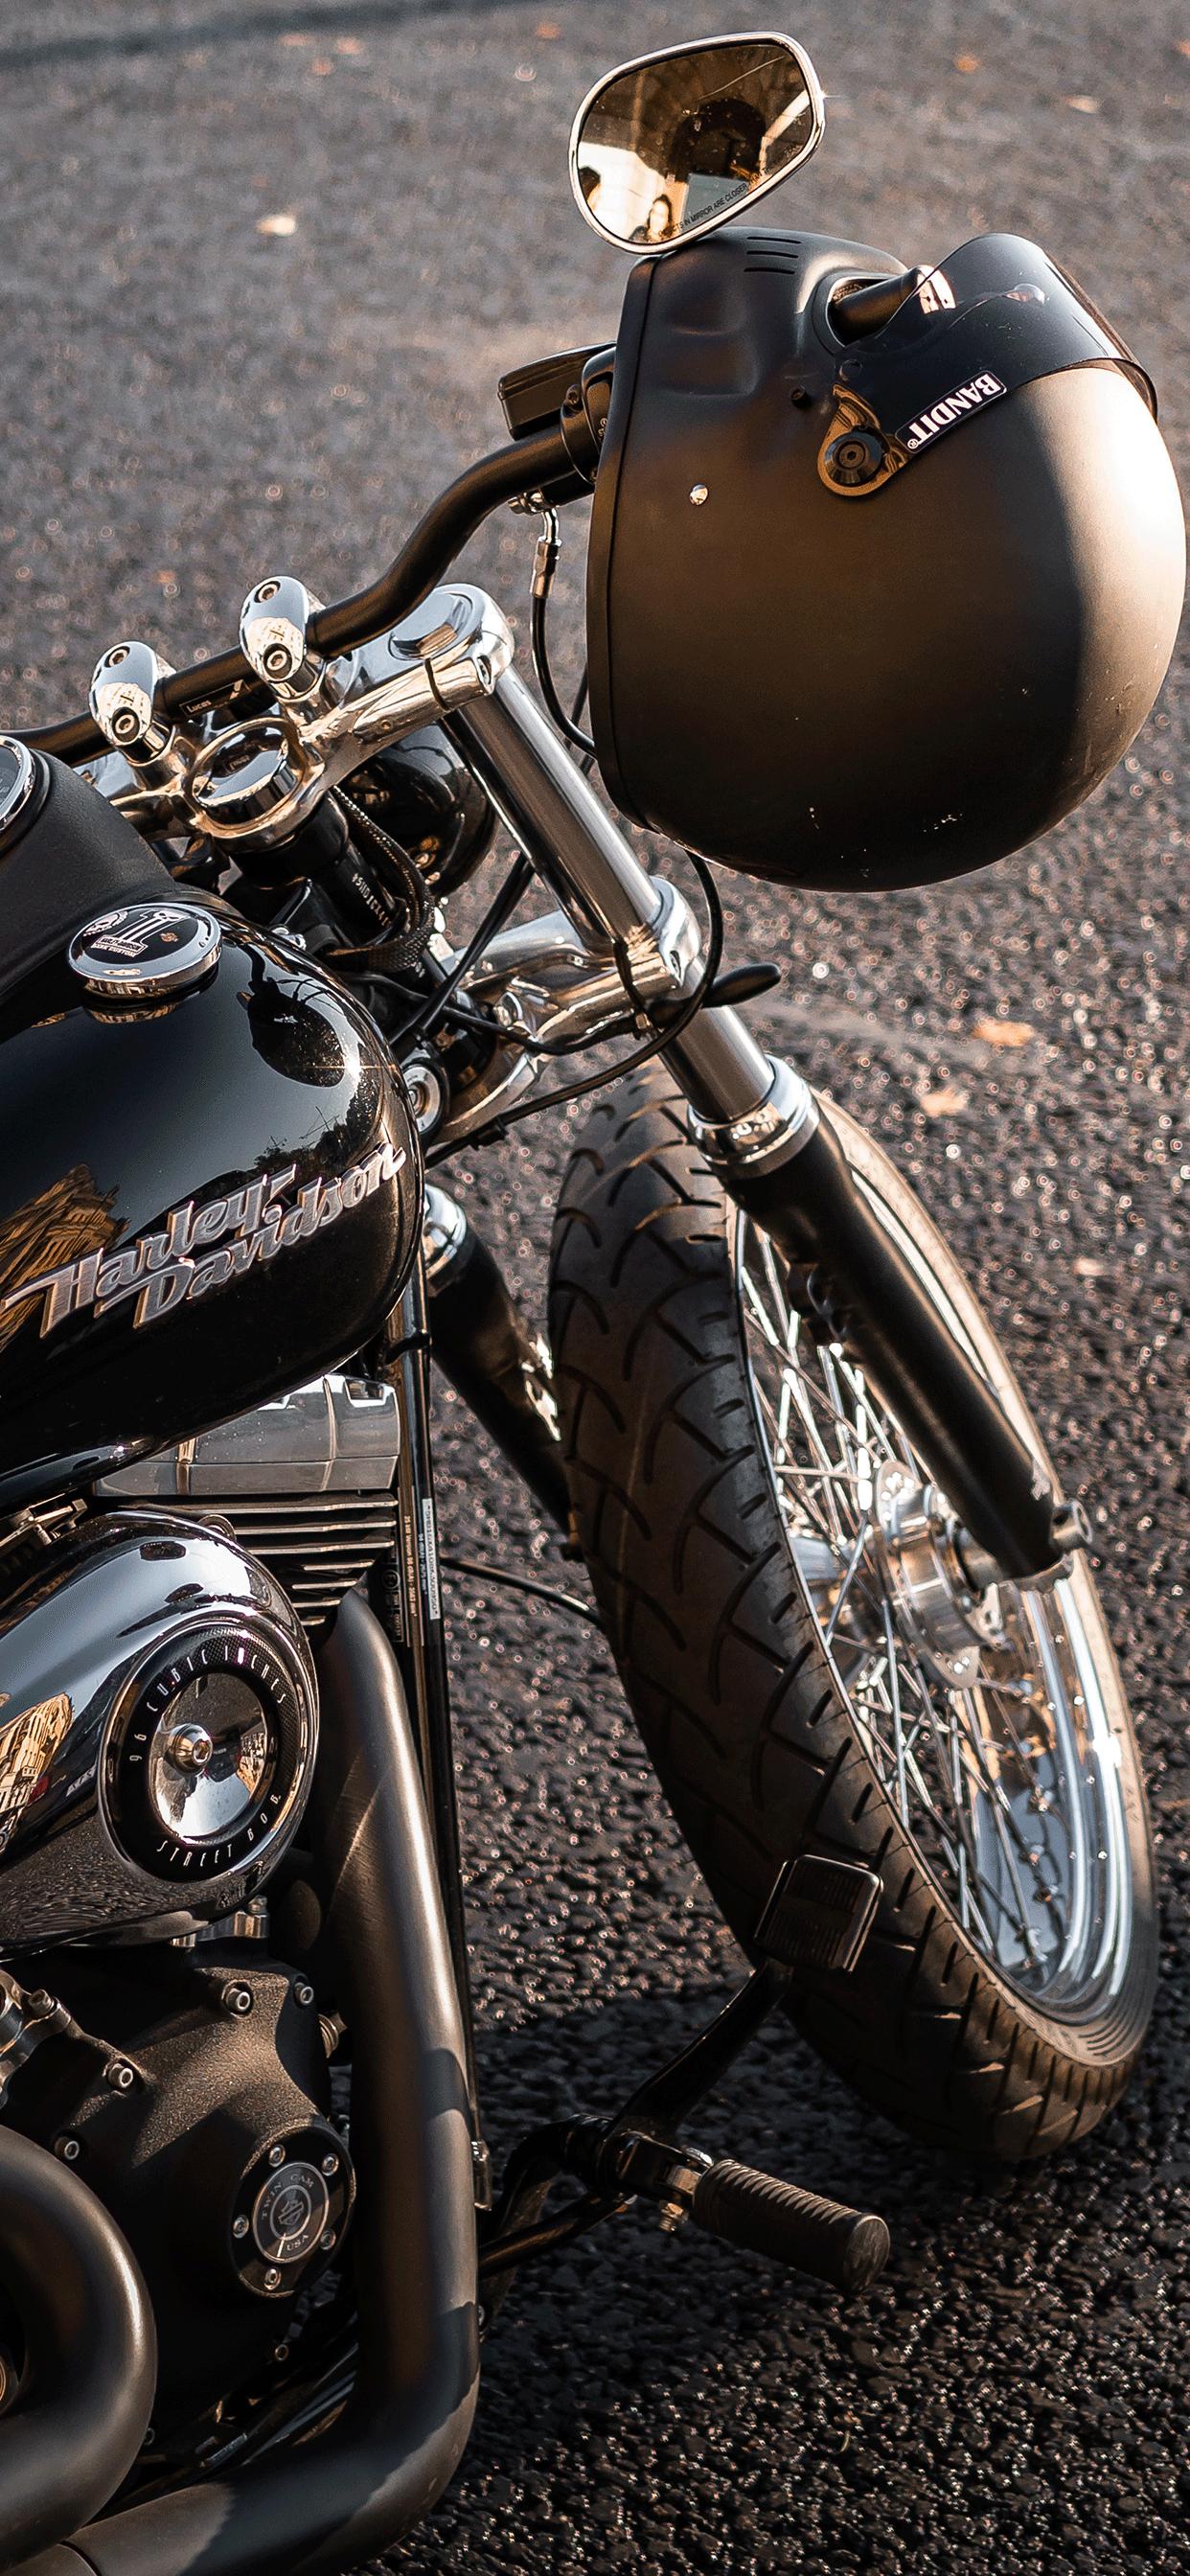 iPhone wallpaper harley davidson black Harley Davidson